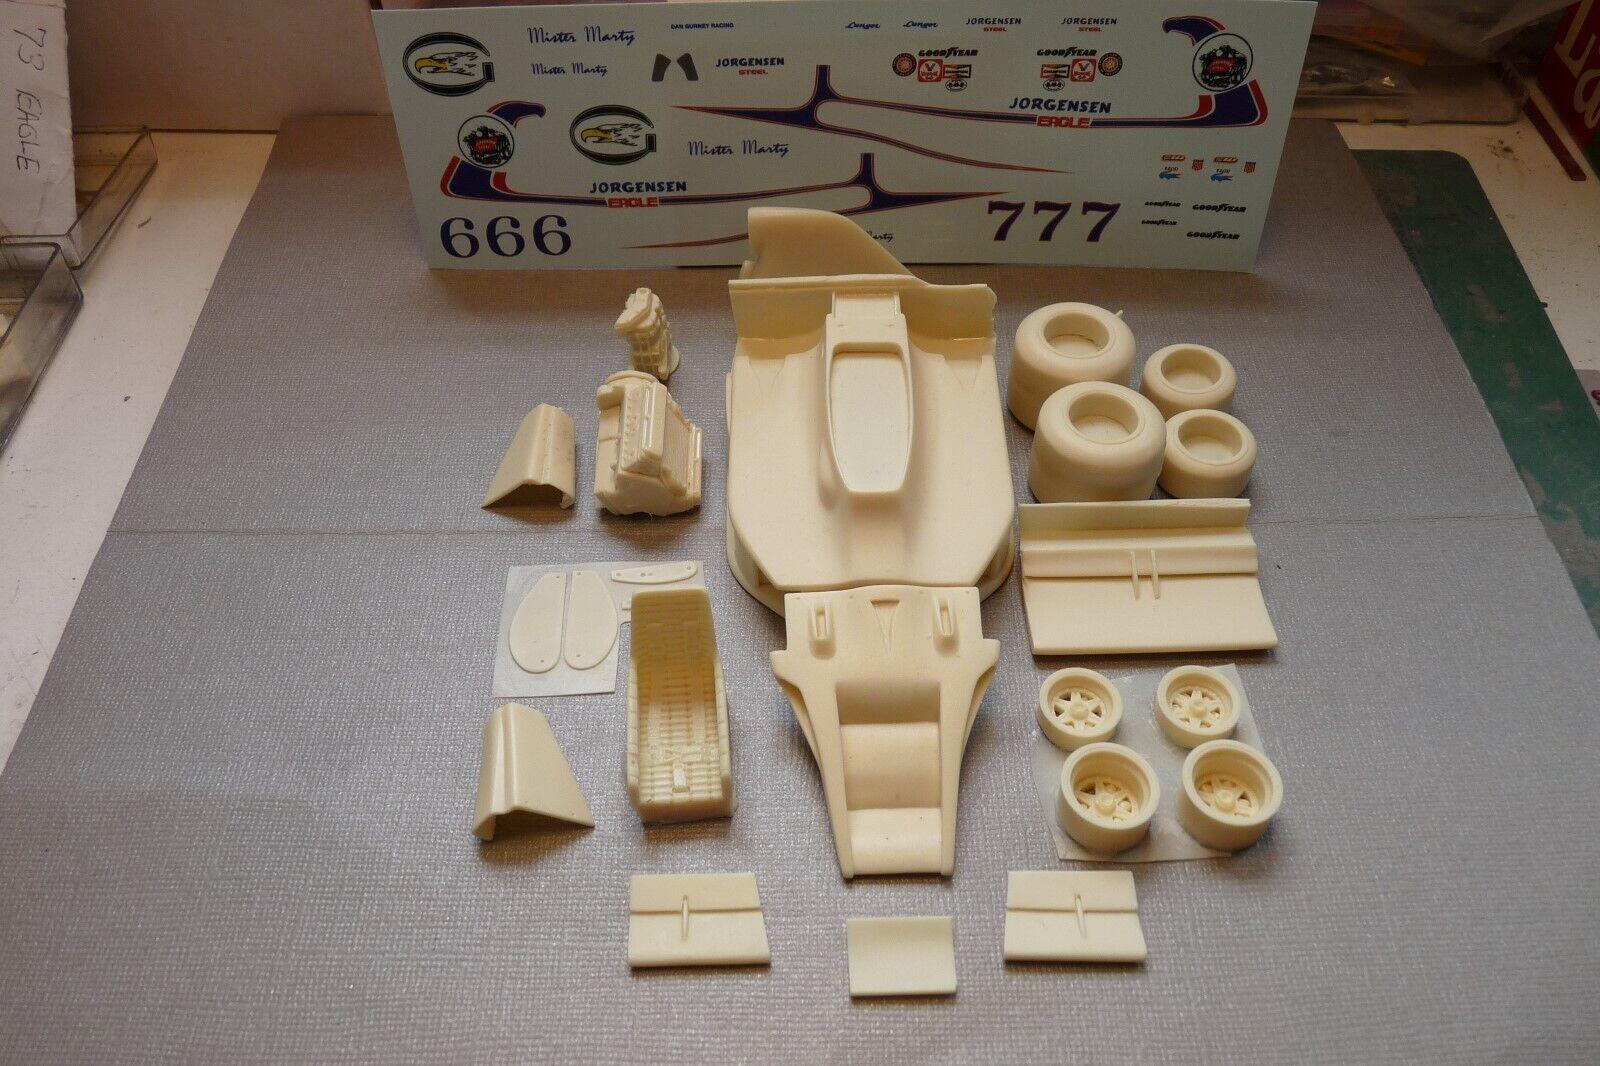 1   25 1974 adler f5000 harz modell - kit, das harz, formel 1, can-am